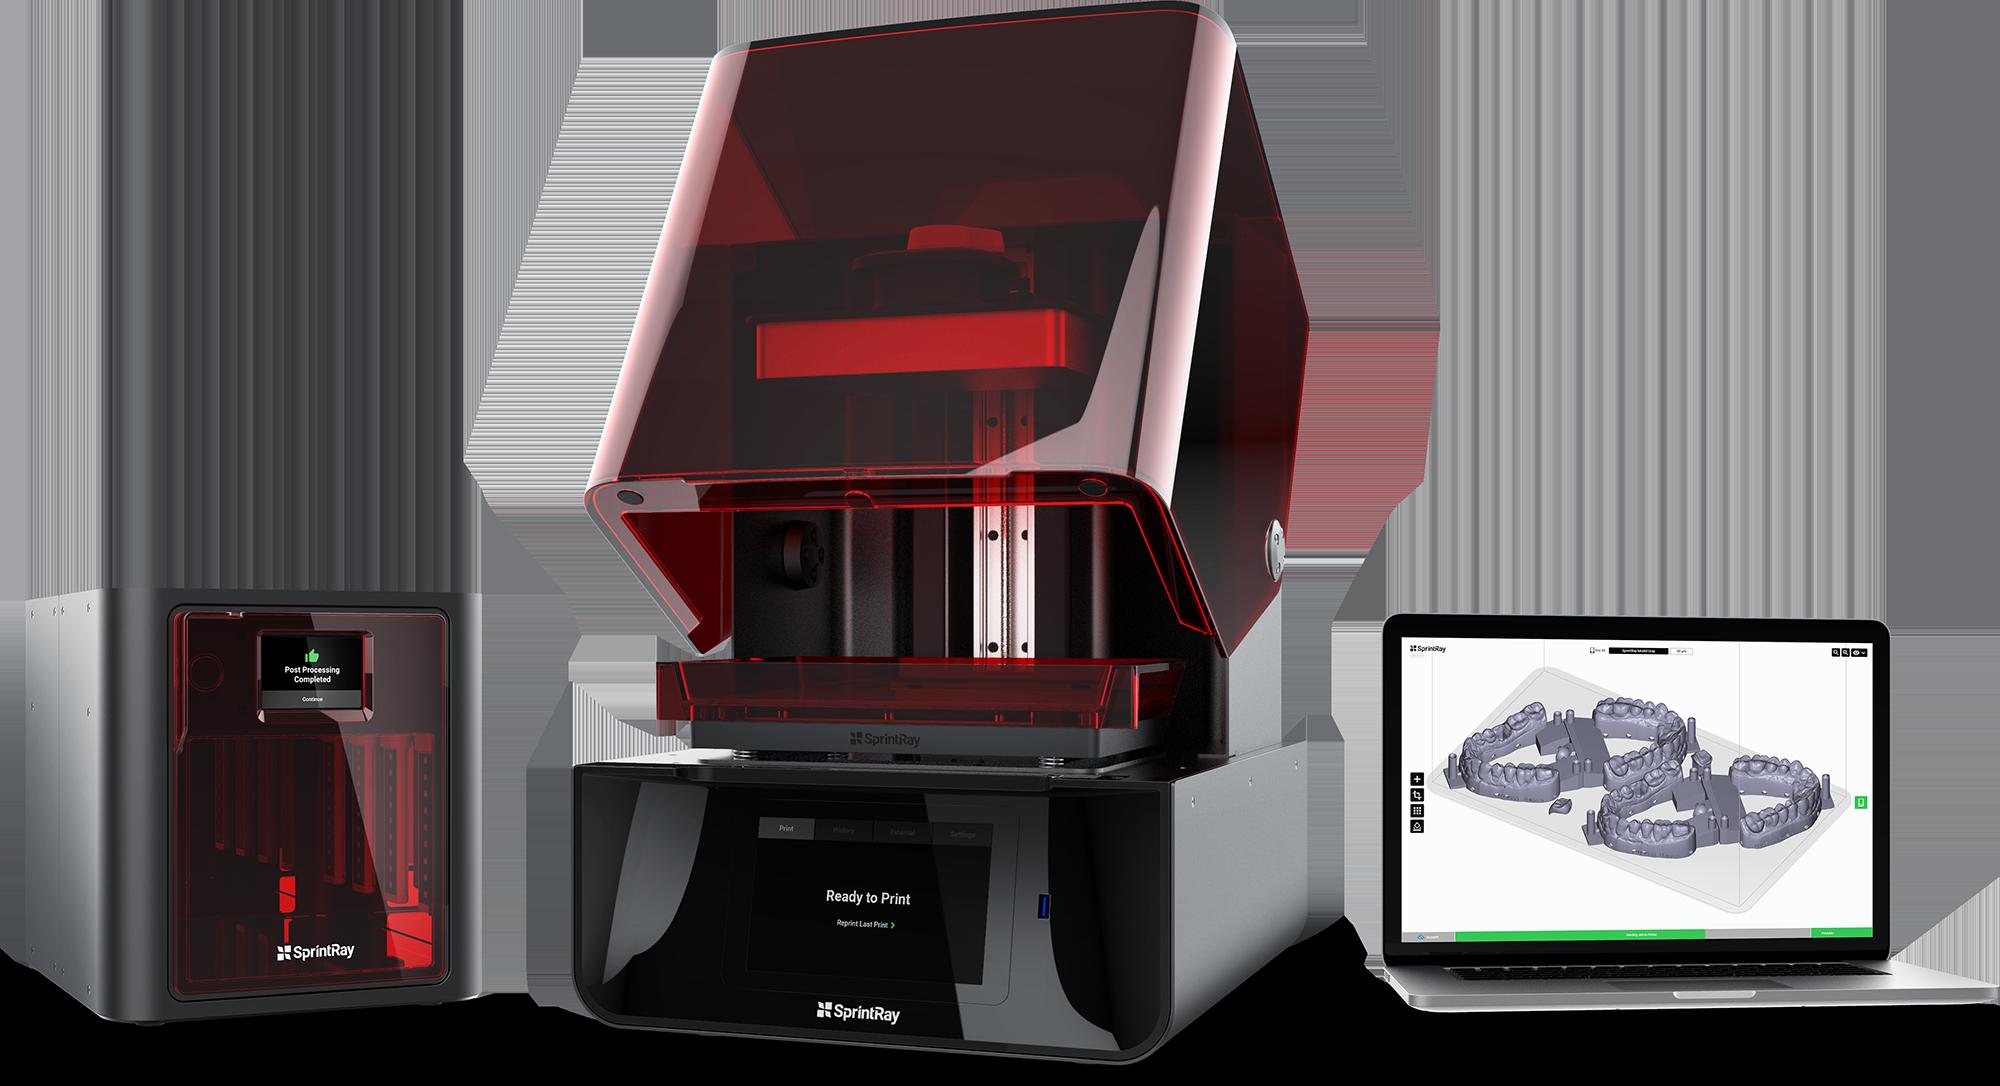 Sprintray Introduces Pro95 Desktop Dental 3d Printer